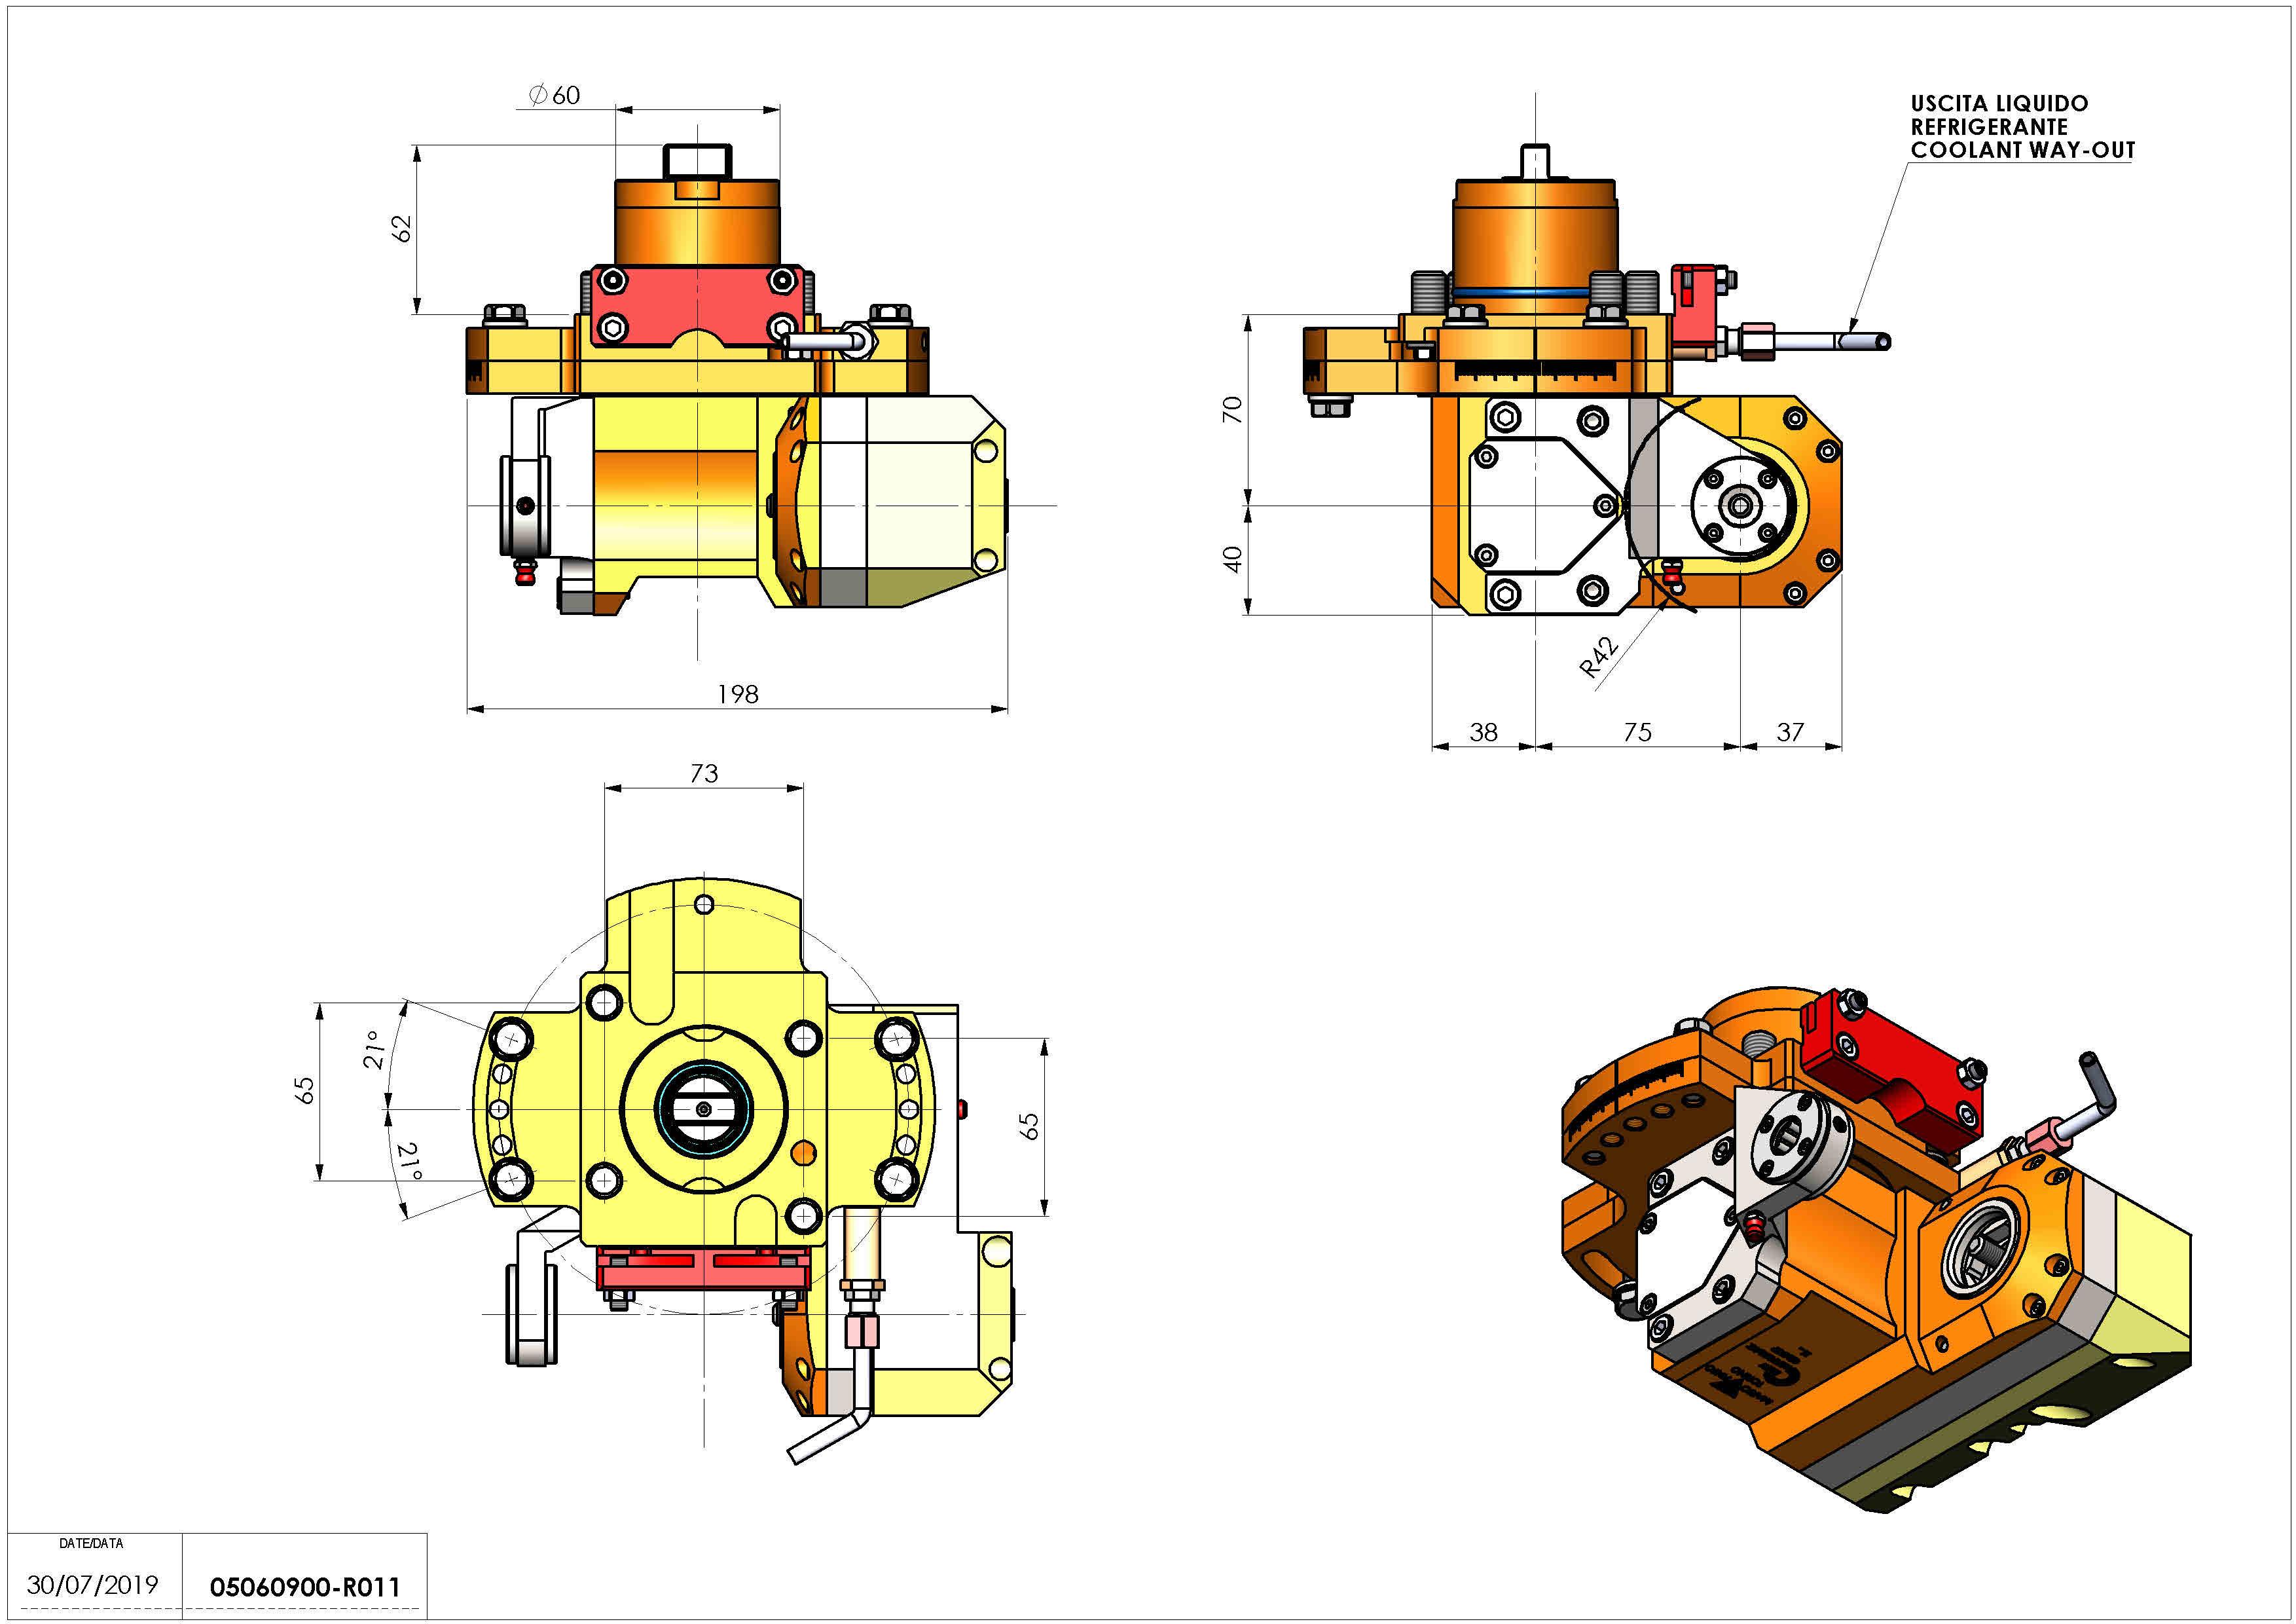 Technical image - LT-HOB-SAW D60 2.5:1 H70.